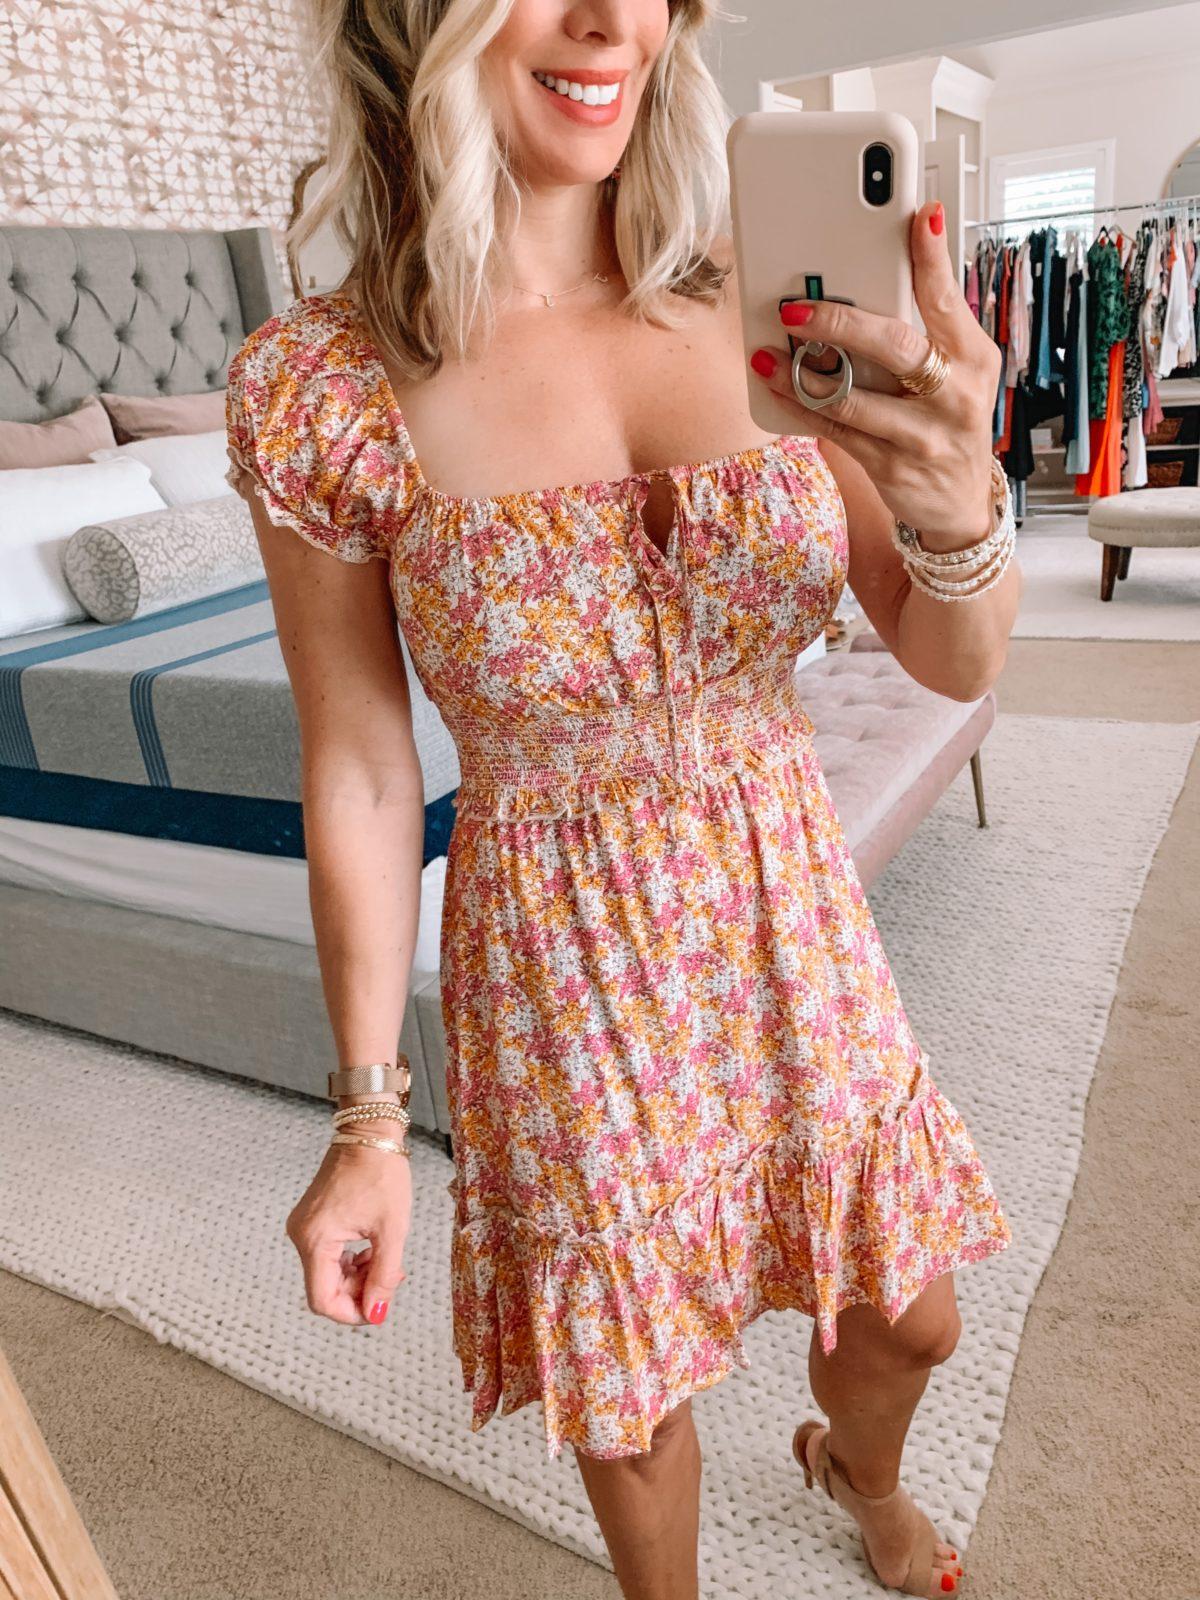 Dressing Room Finds Nordstrom and Target, Smocked Mini Dress, Nude Heels